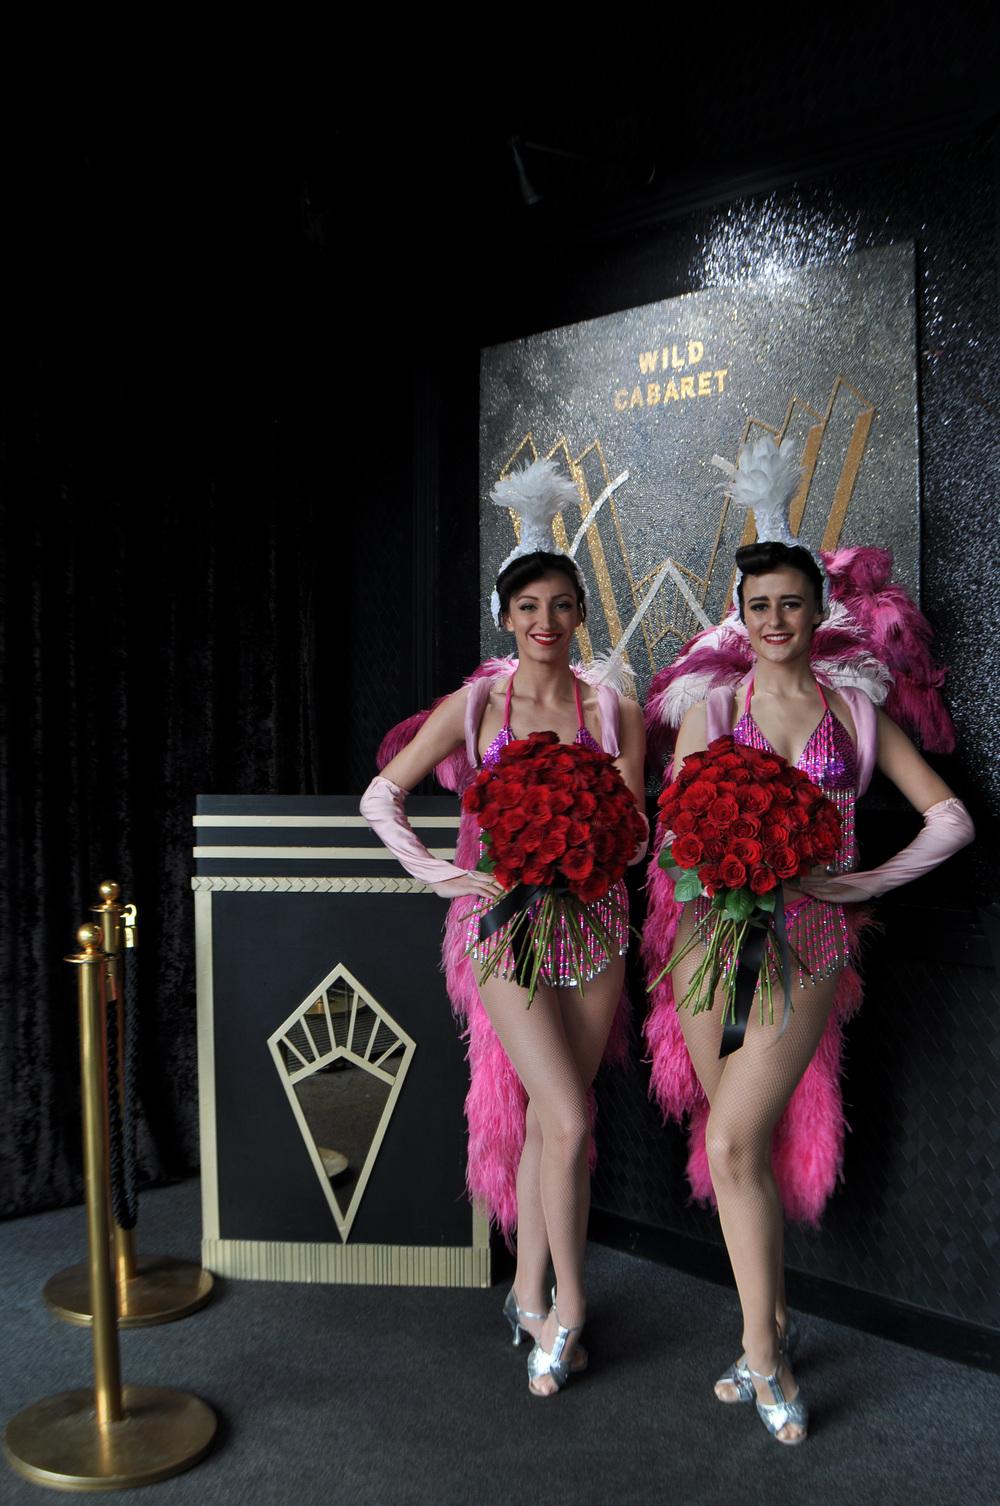 glasgow-florist-cabaret